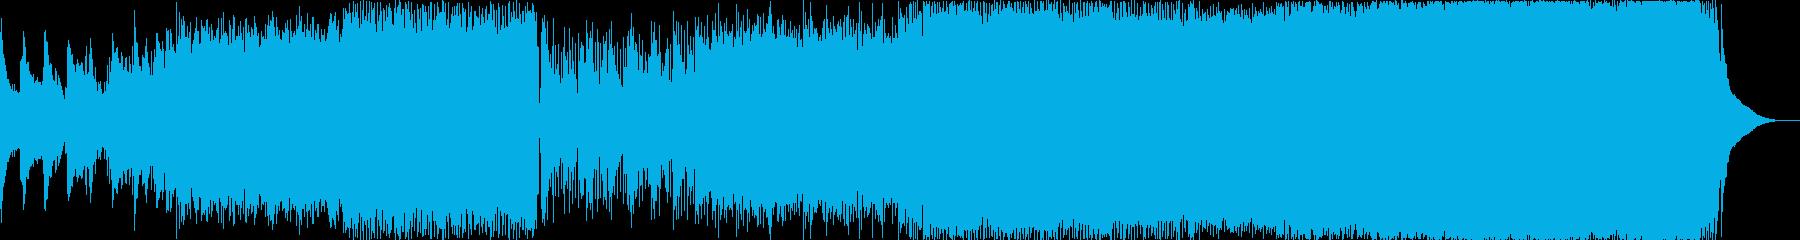 "It is a karaoke of ""The original sin"".'s reproduced waveform"